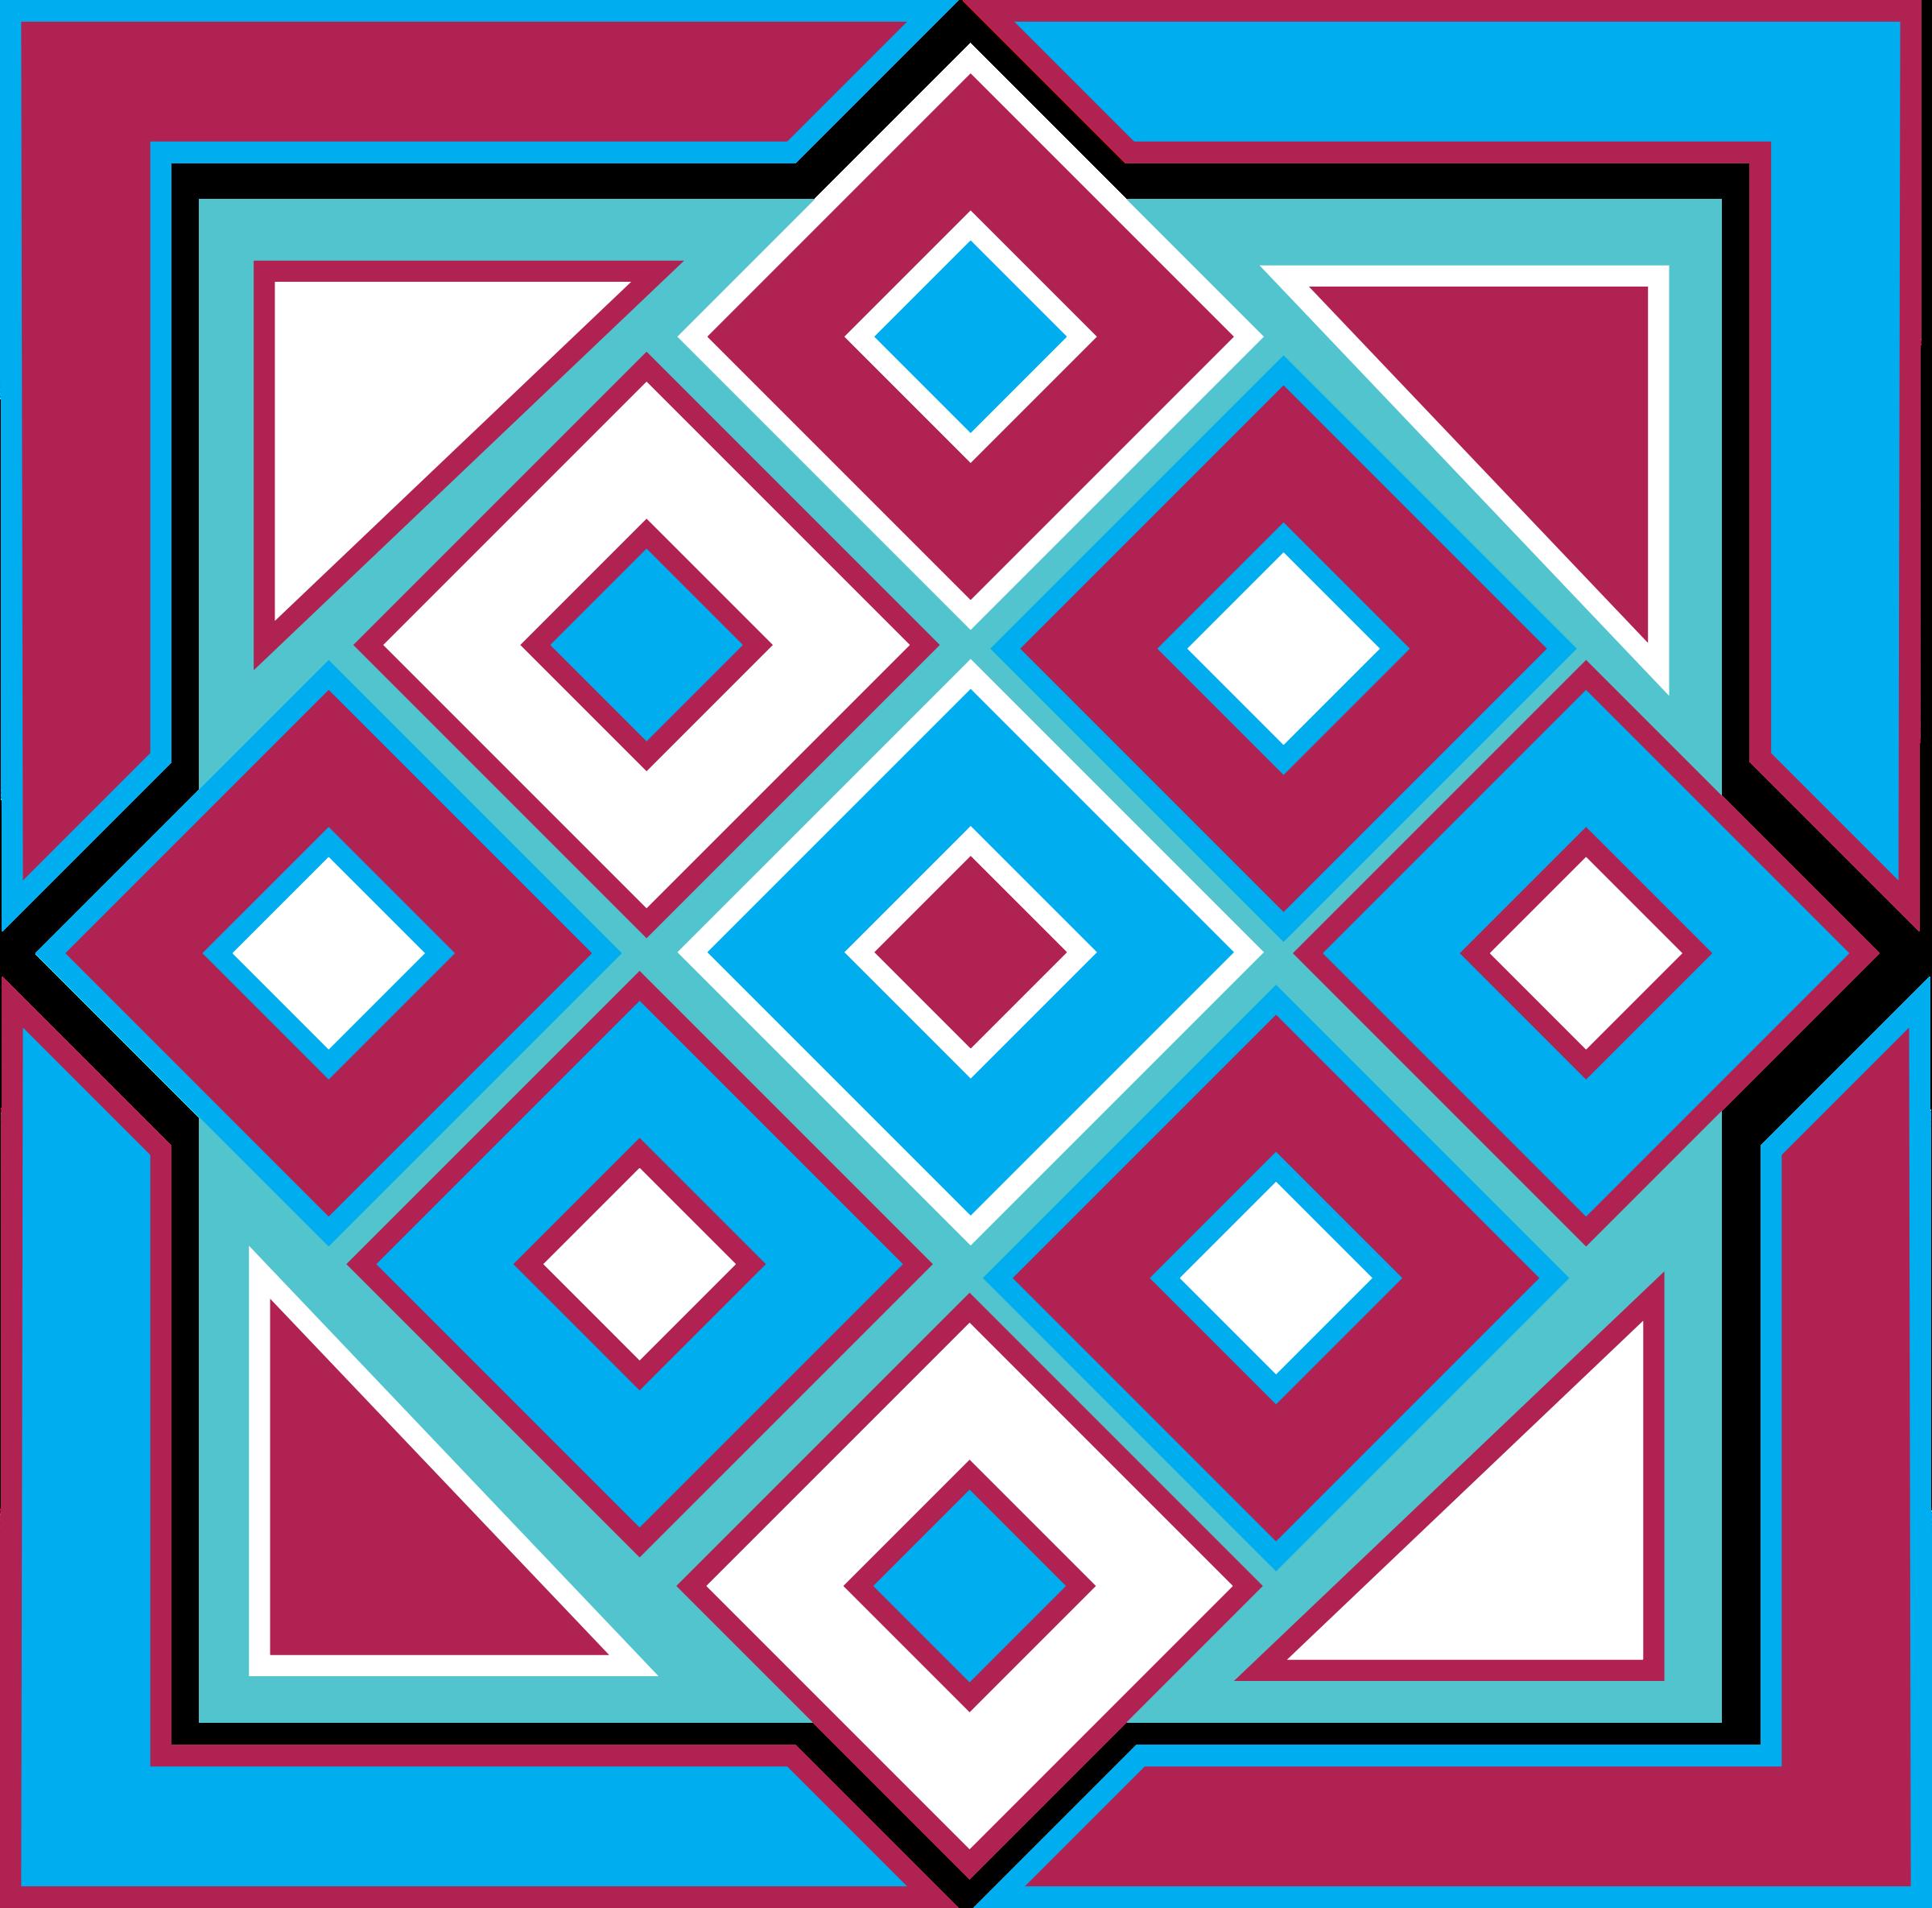 Clipart - Square Box Design Blue, Red & Aqua